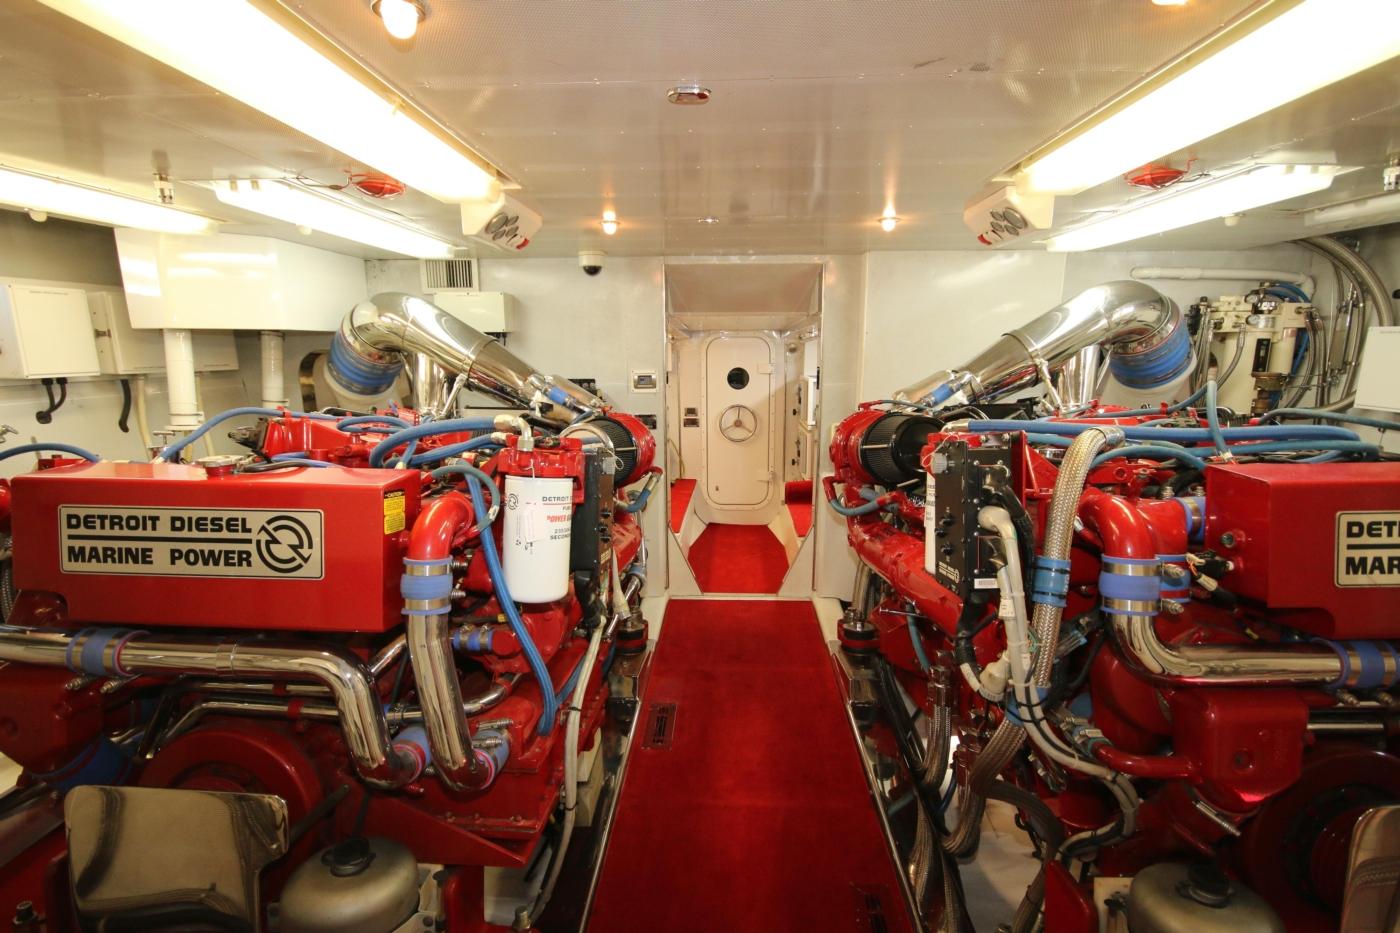 1997 Nordlund Motoryacht, Engine room